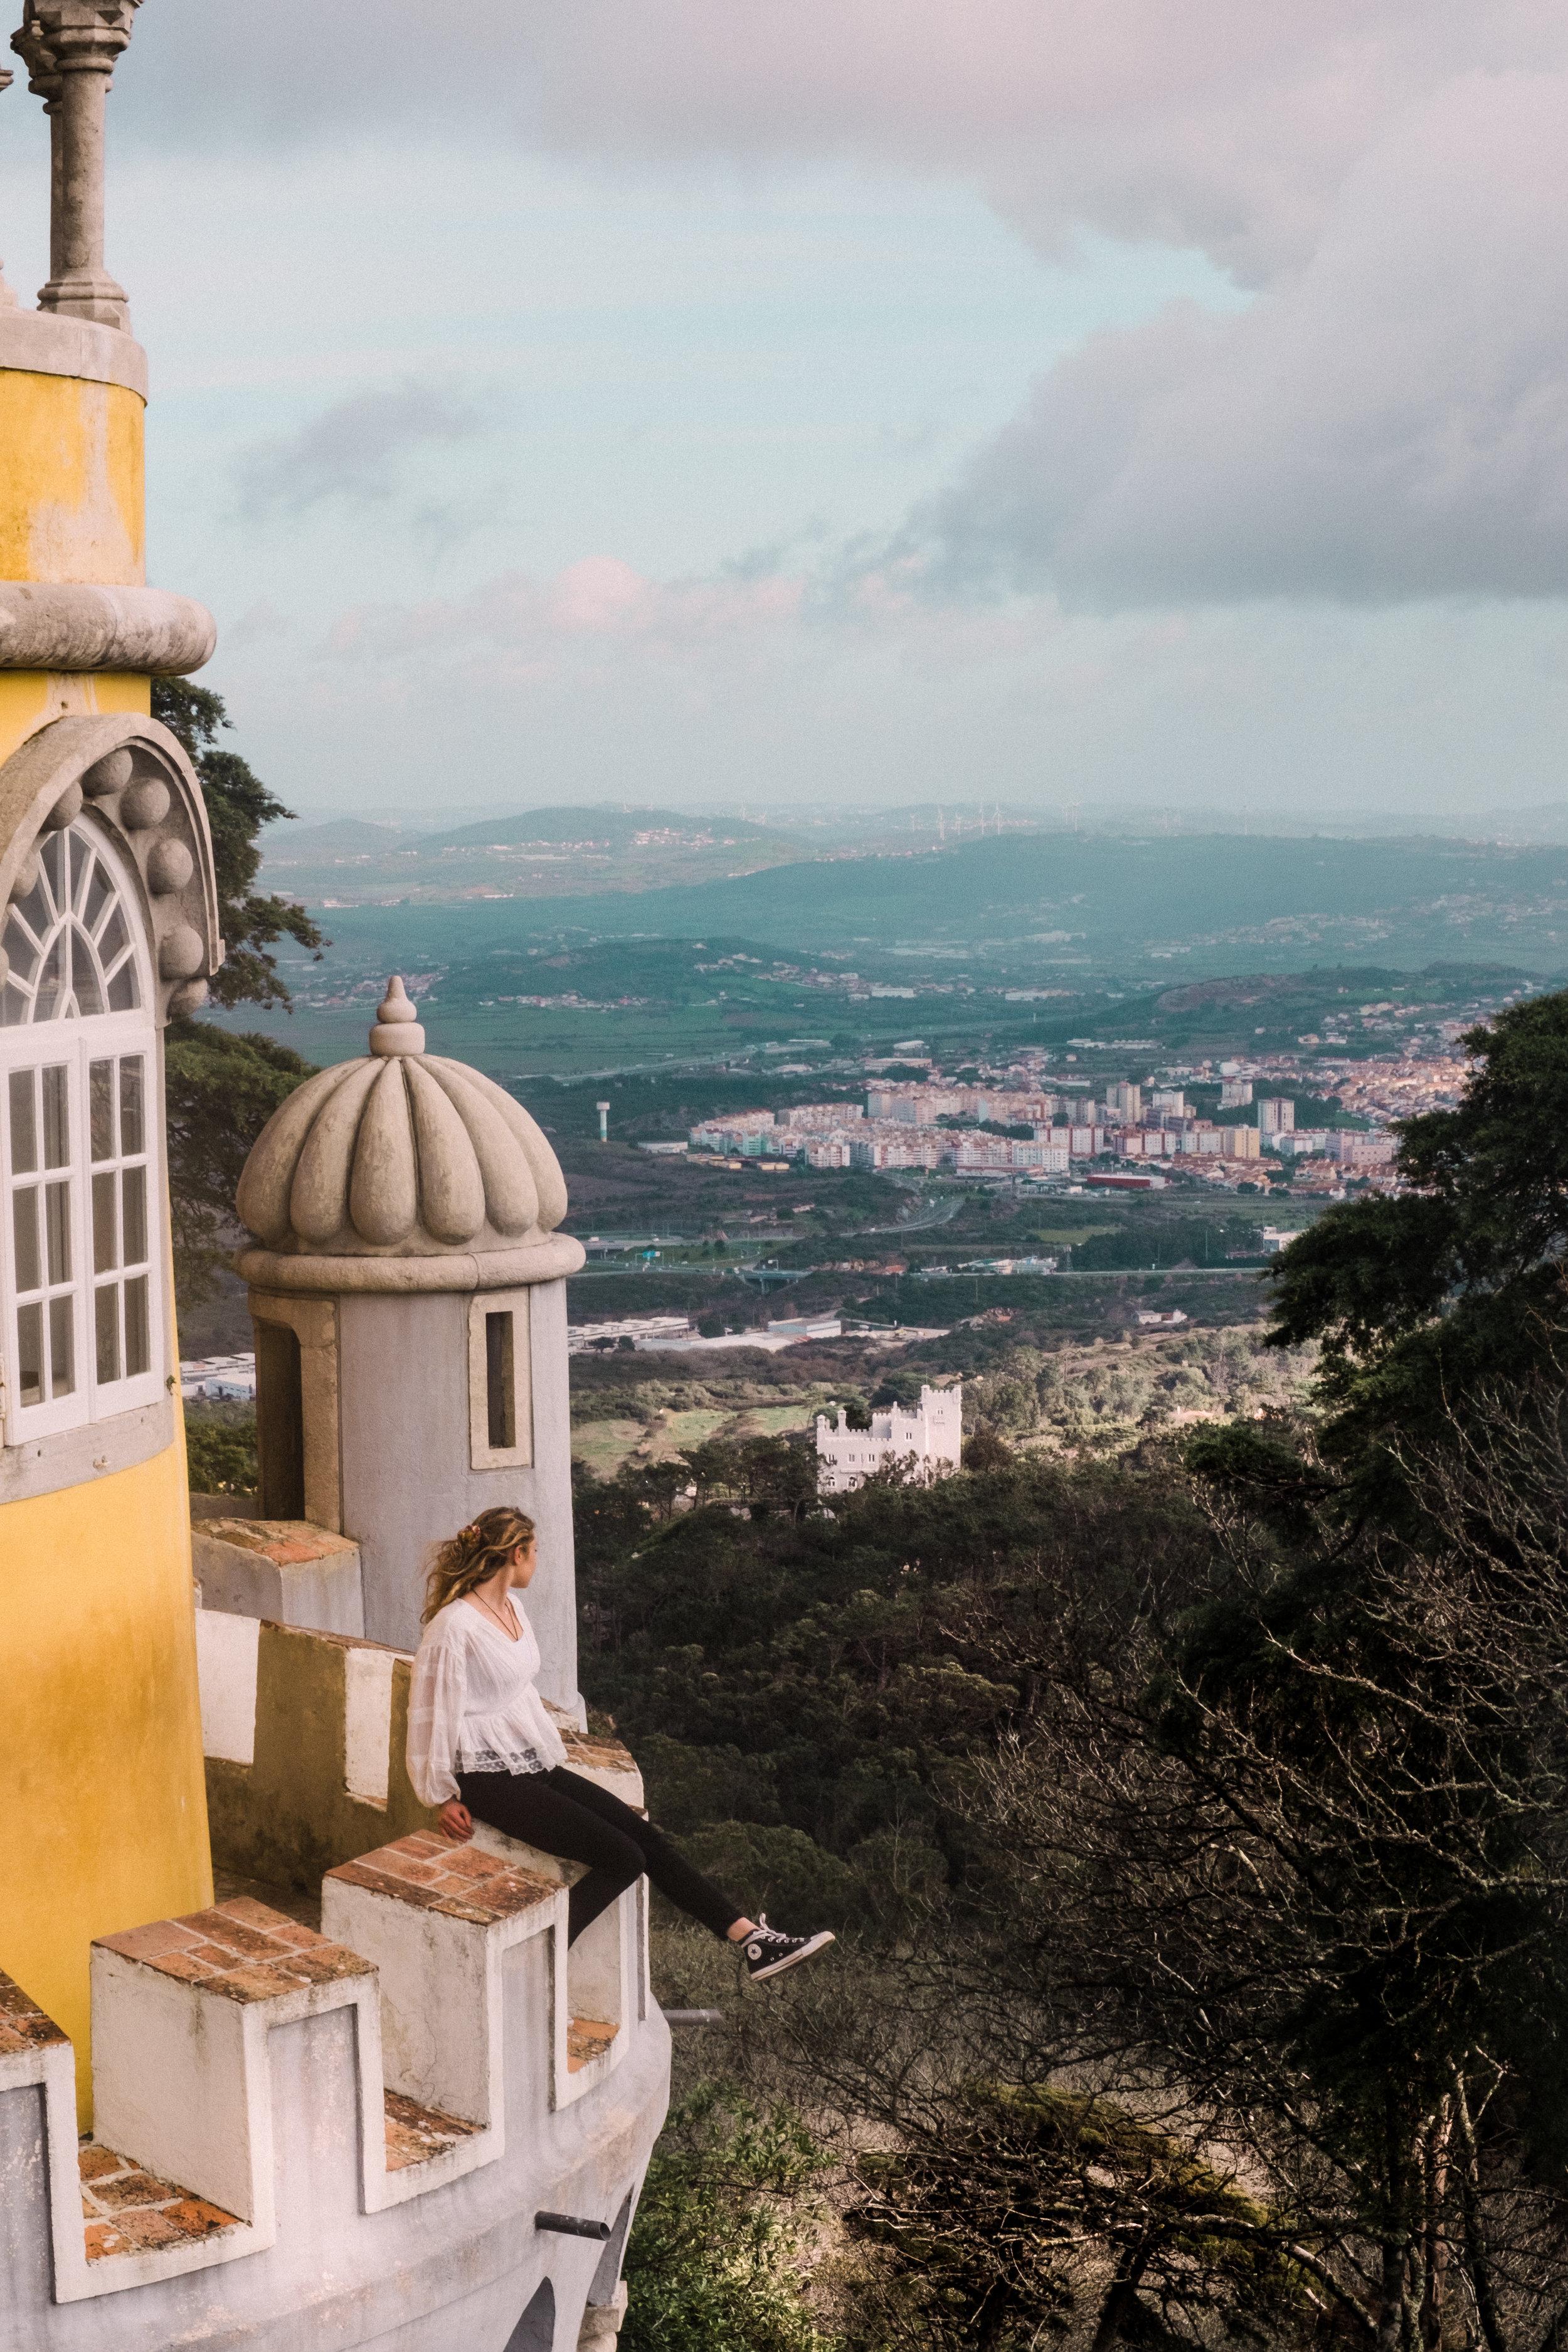 PenaPalace_Sintra_Portugal_JuliaMattis_Photo02.jpg